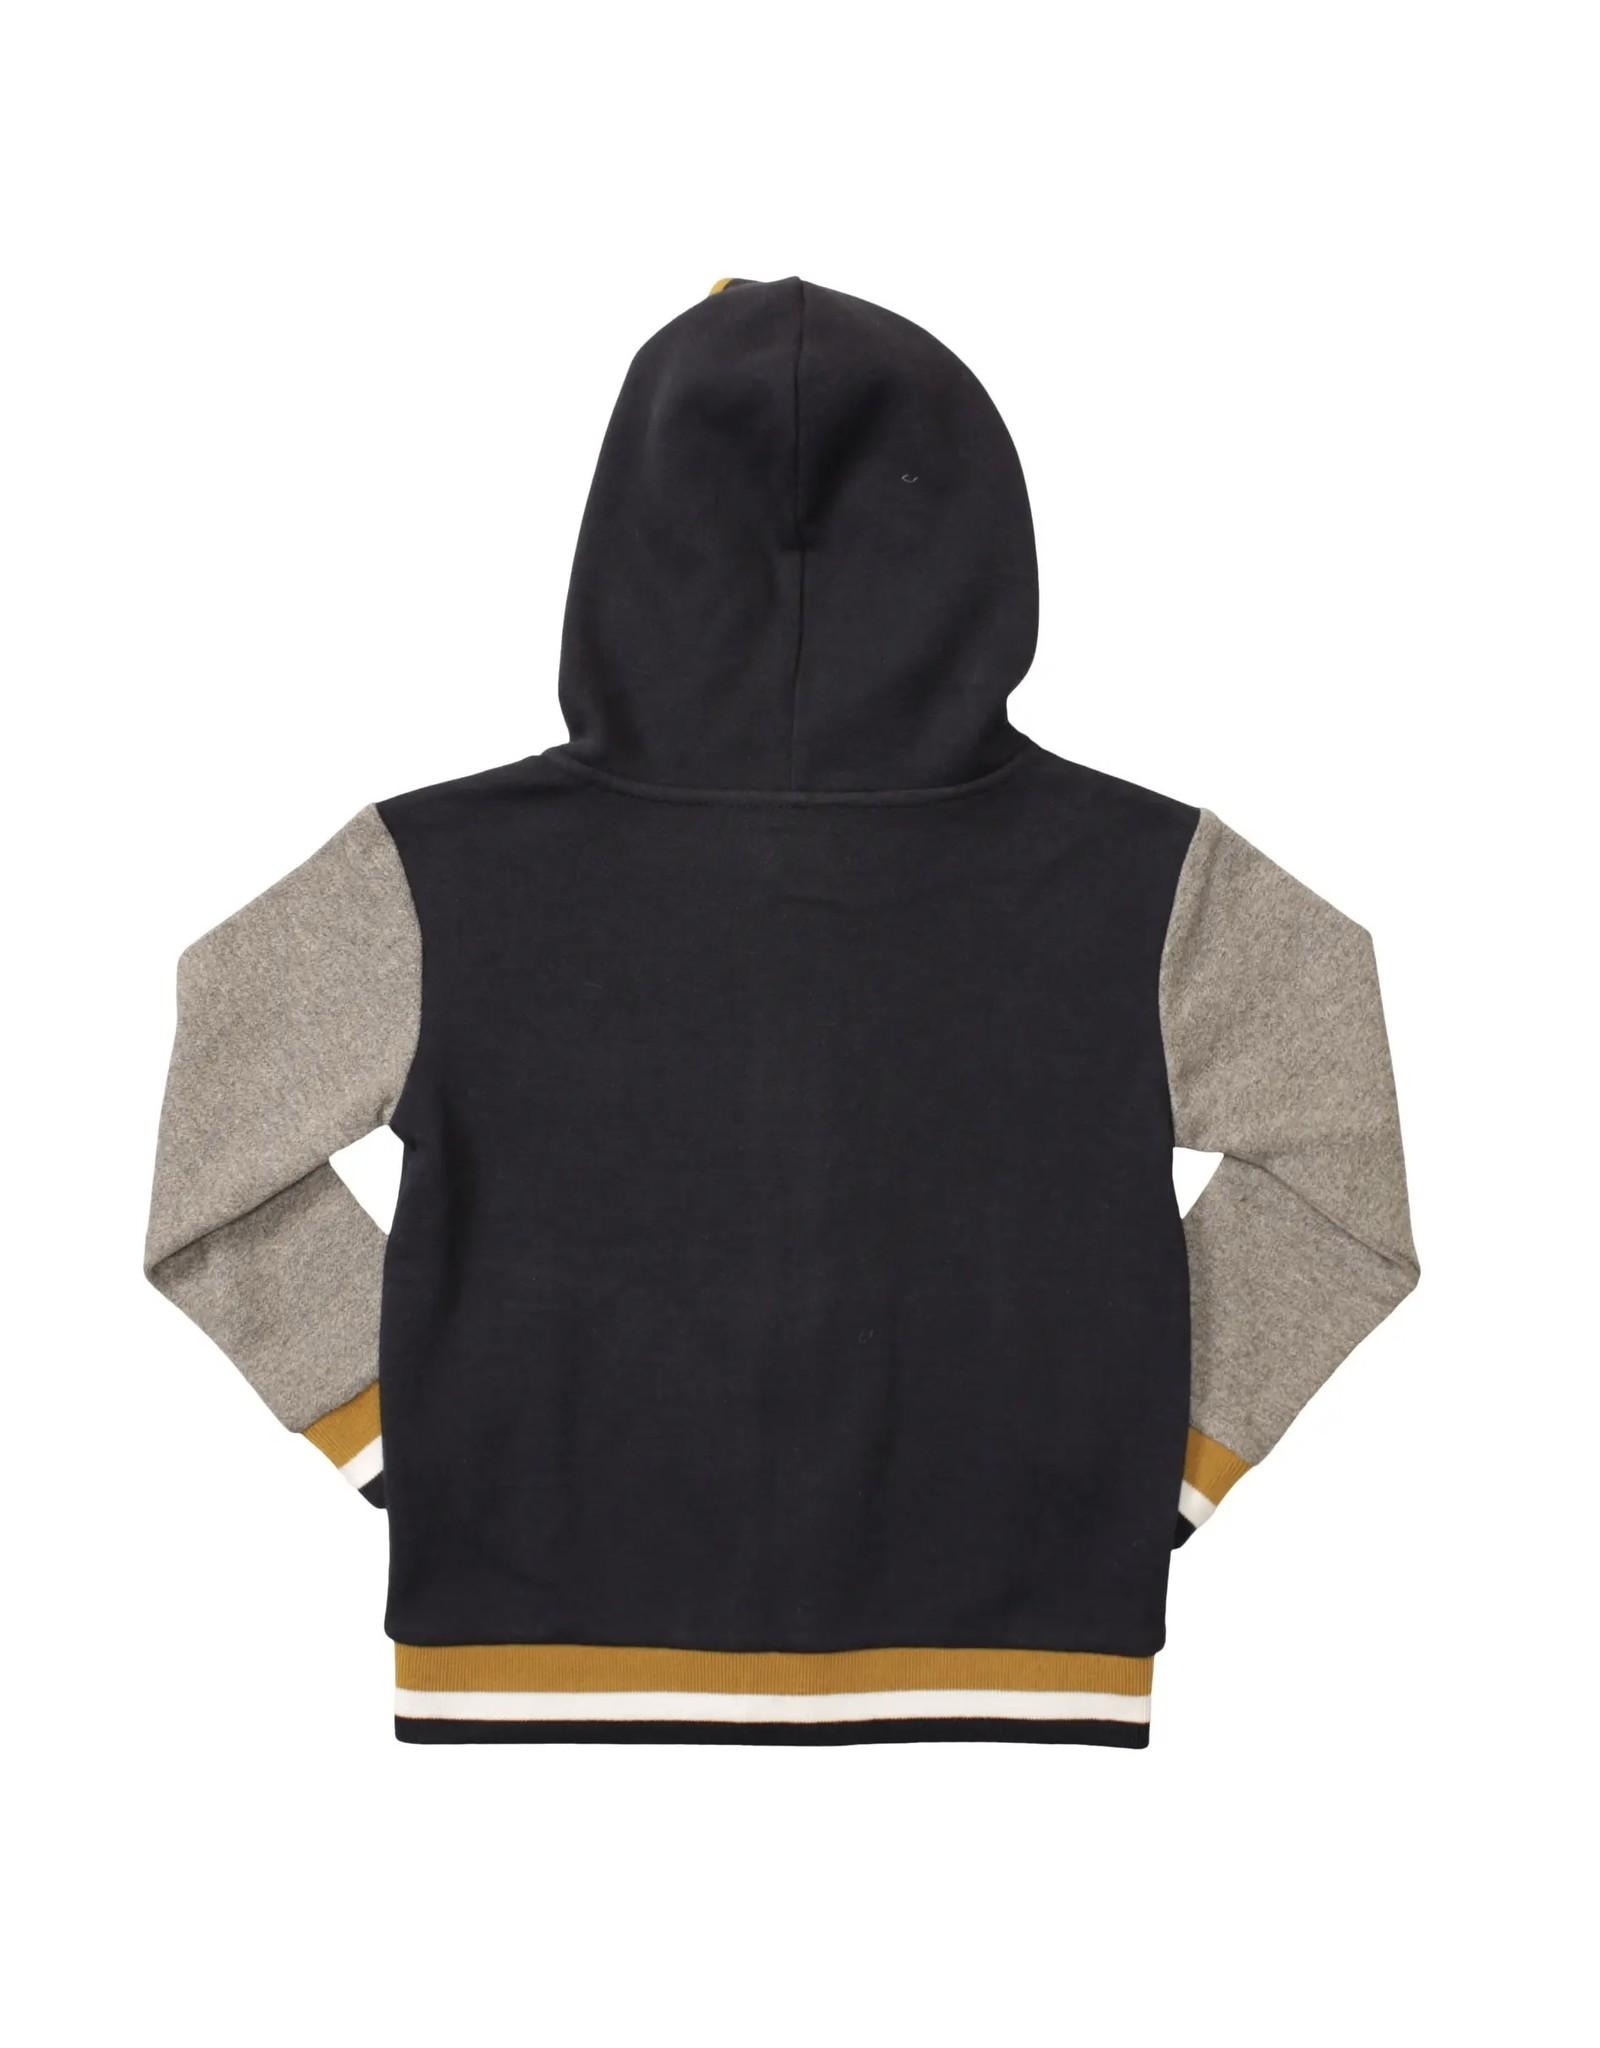 Bear Camp Bear Camp- Zip Up Hoodie w/Contrast Stripe Cuffs